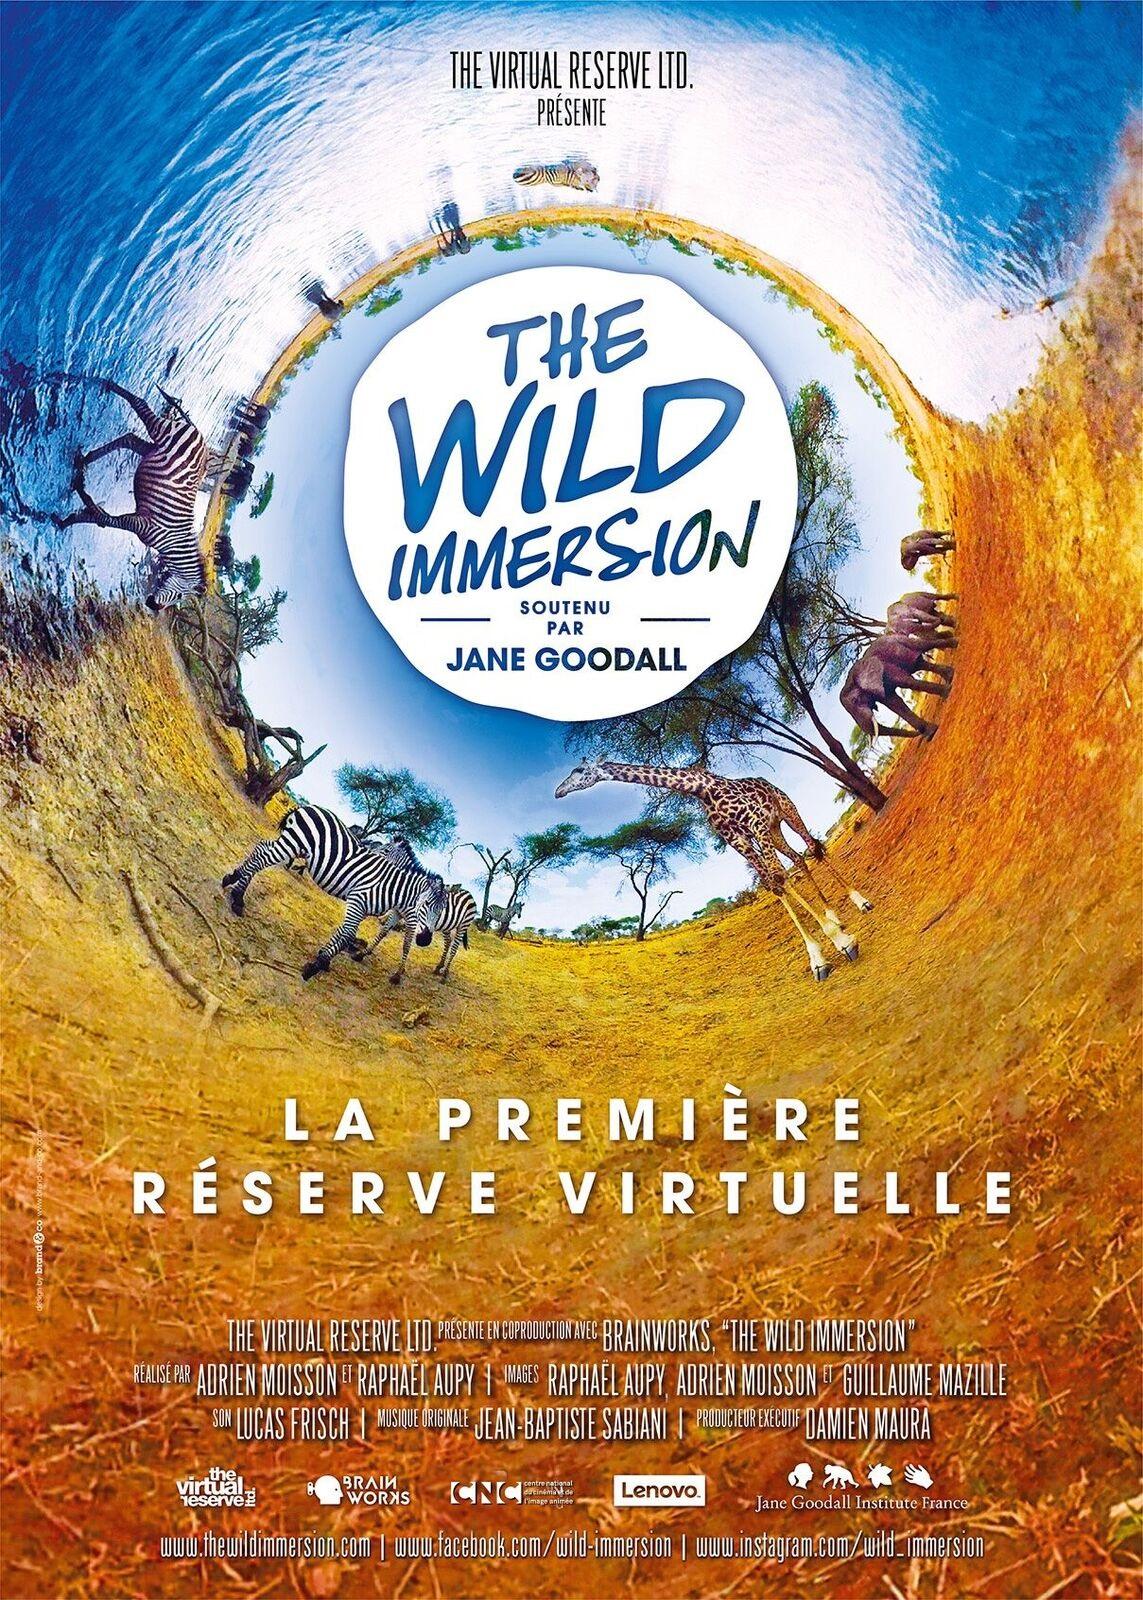 Télecharger The Wild Immersion 1fichier